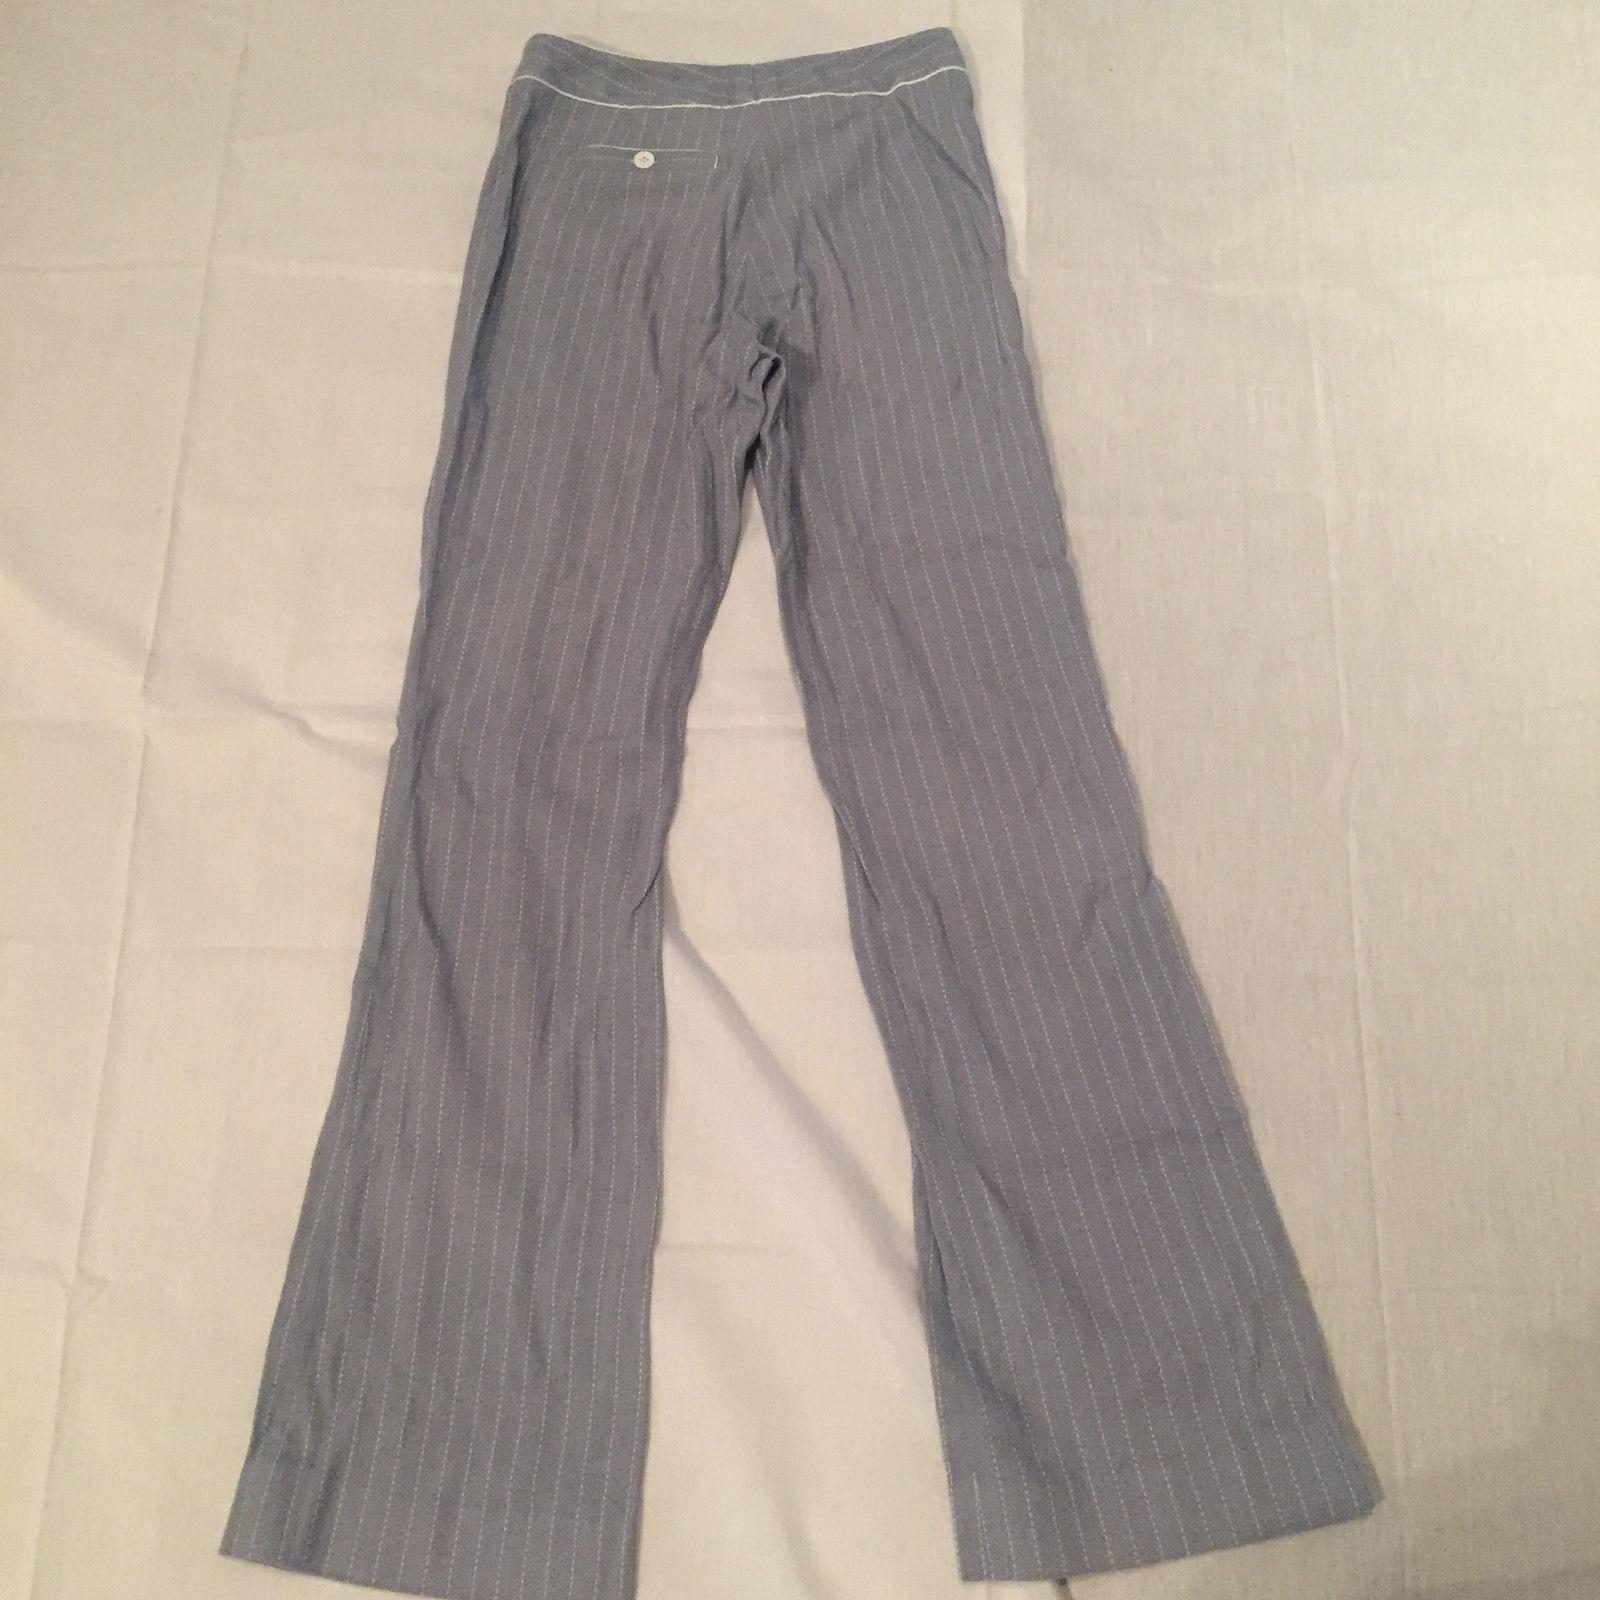 Etcetera Womens Pinstripe Pants Blue Size 4 Career Work